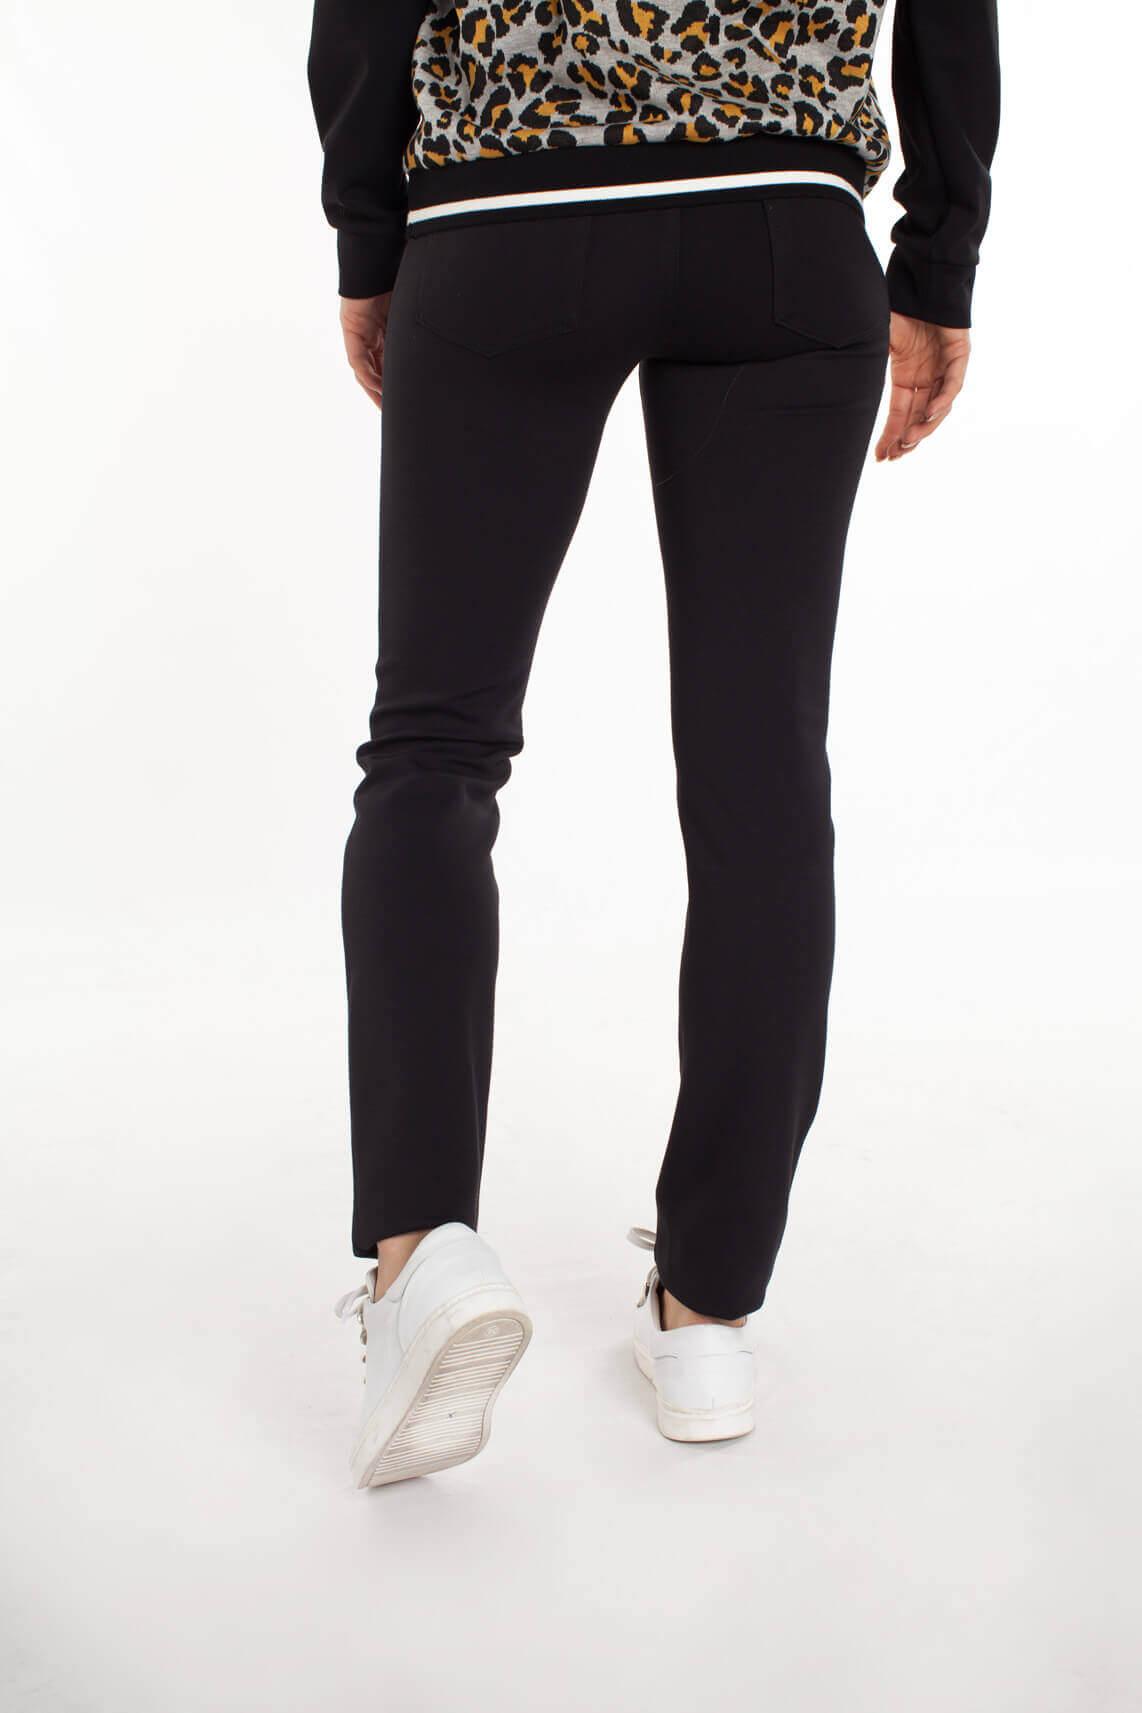 Rosner Dames Antonia stretch broek zwart